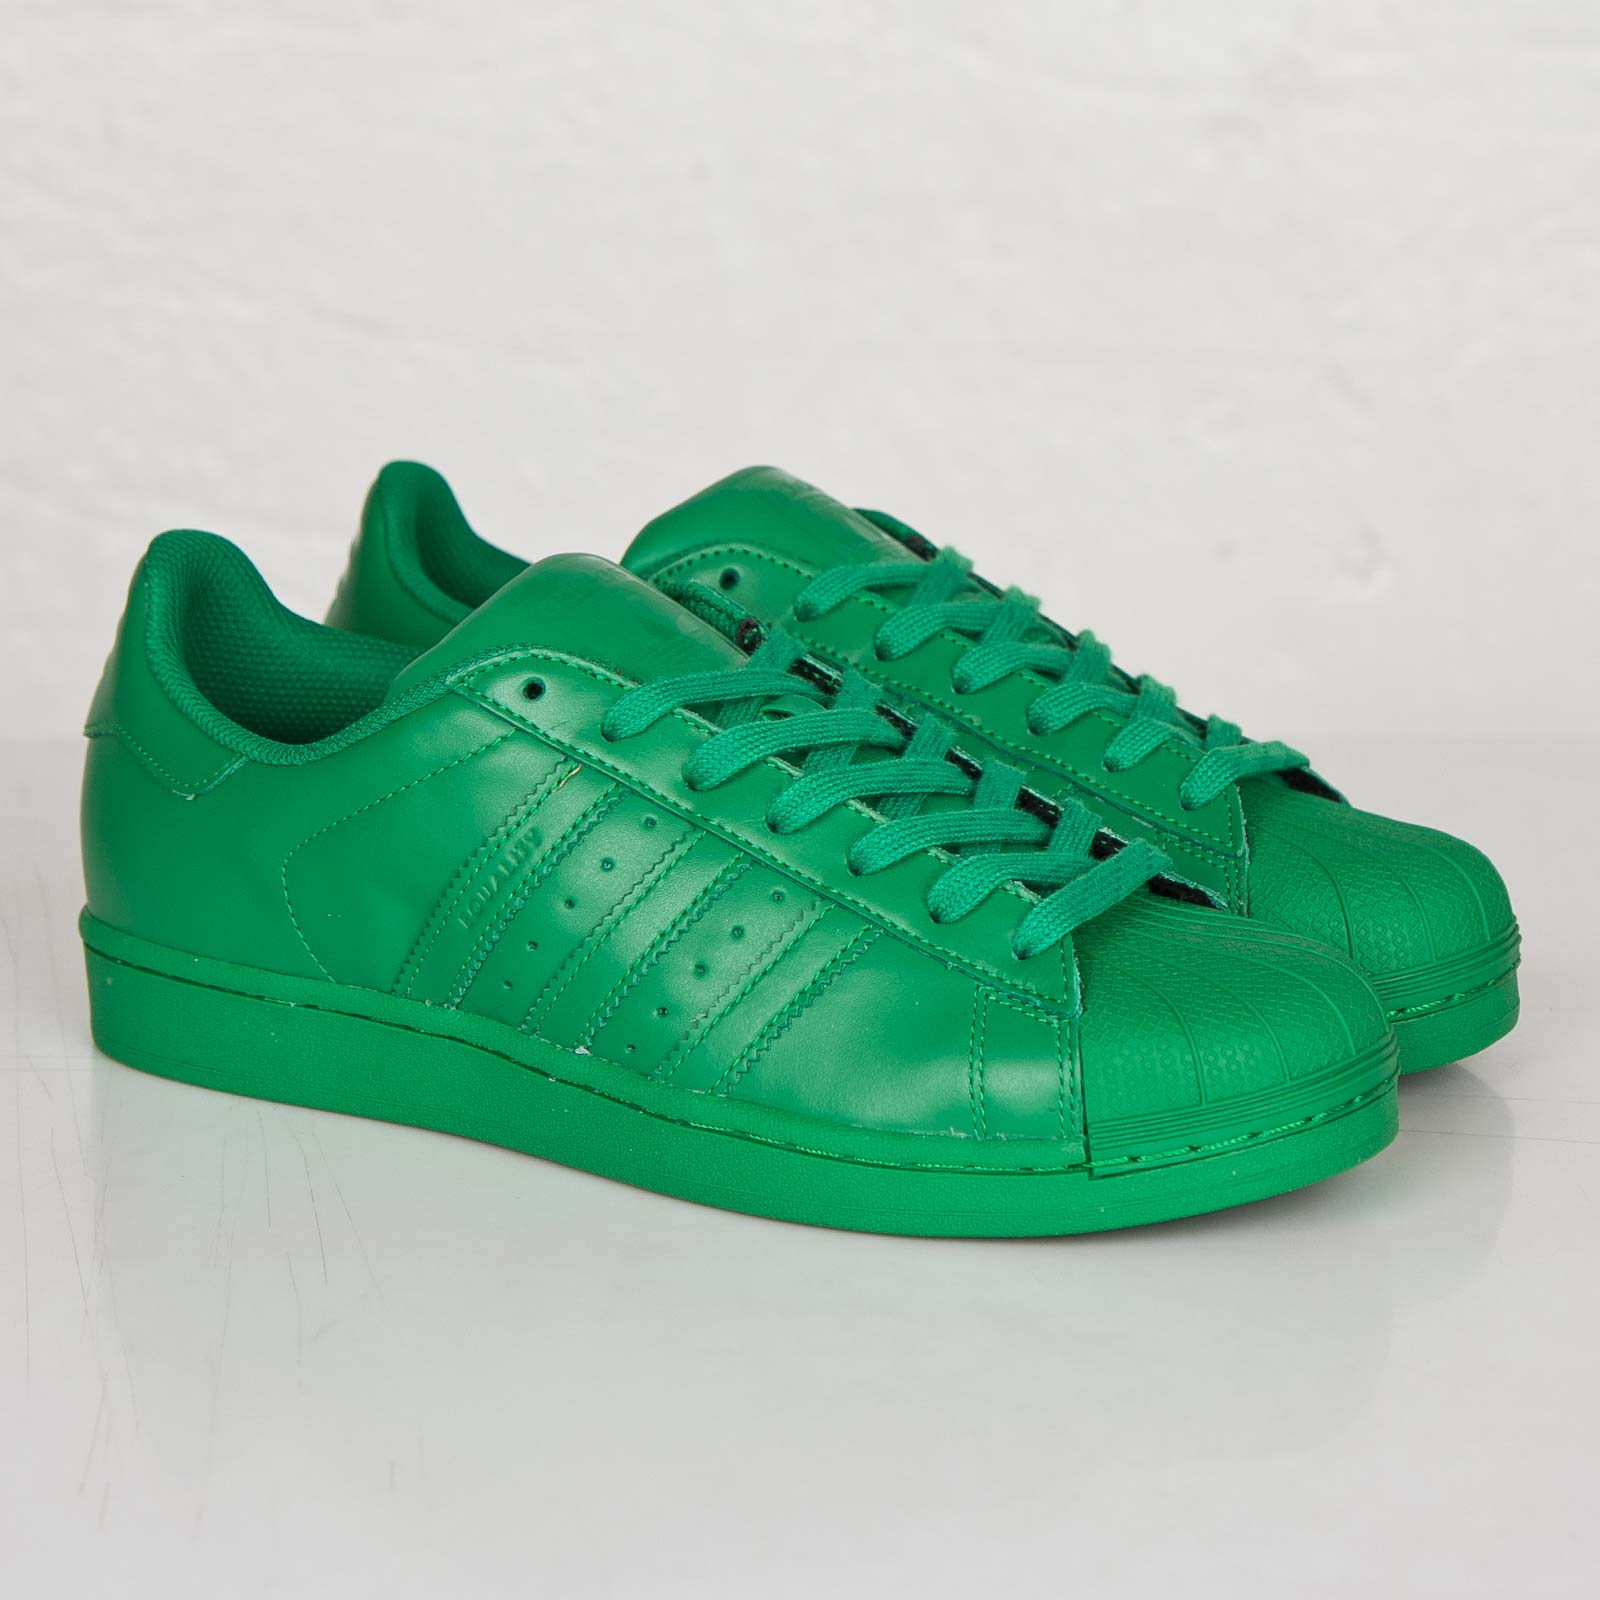 Adidas superstar supercolor pack s83389 scarpe da ginnasticanstuff